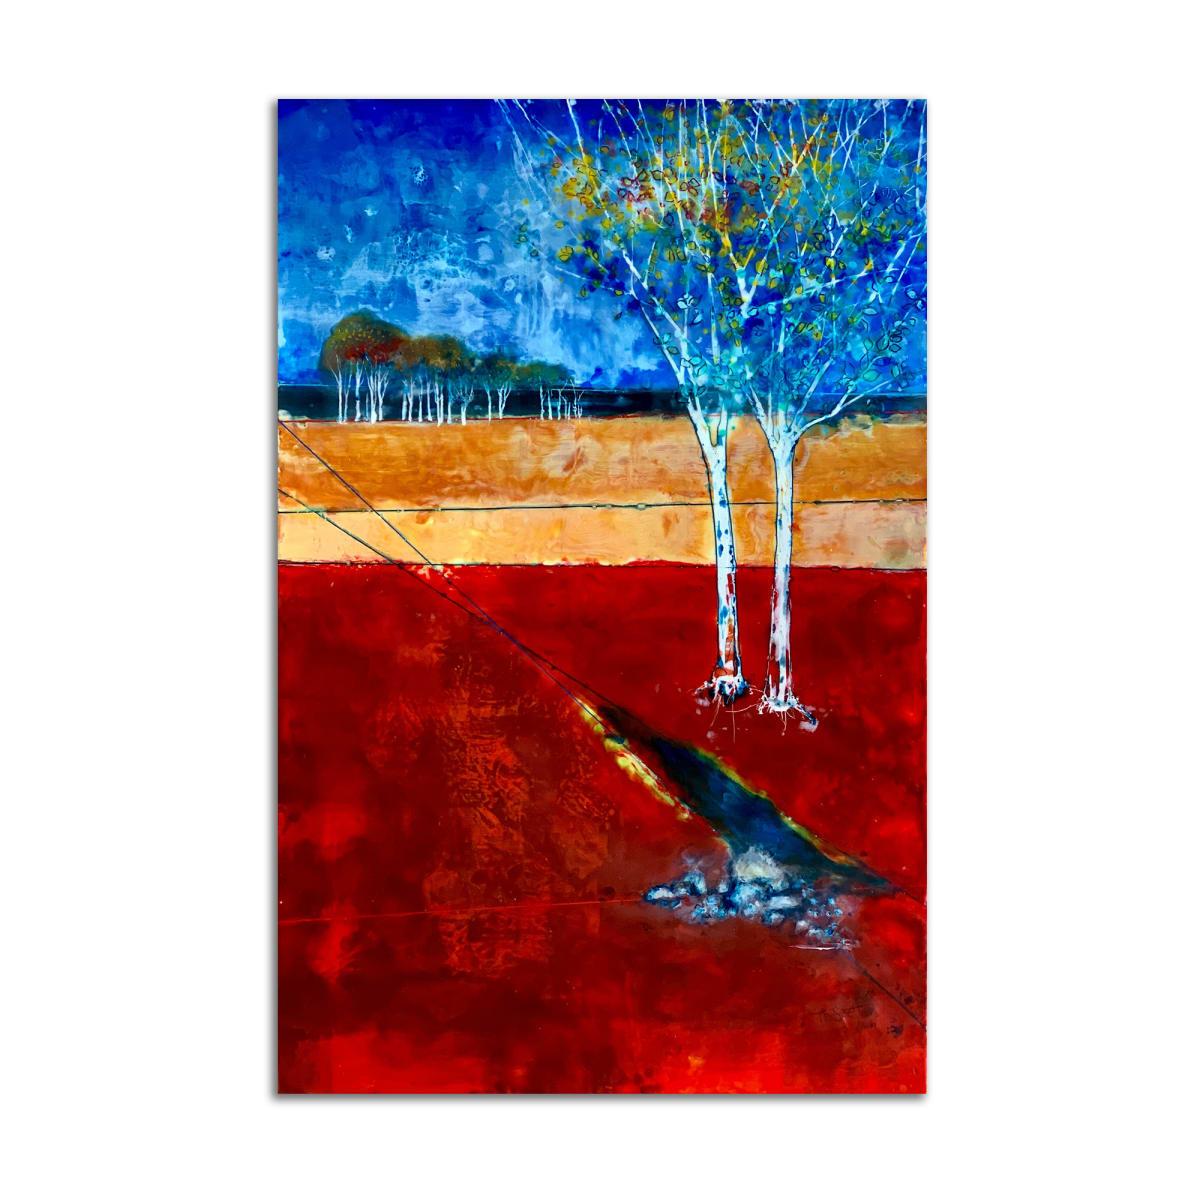 Red Brook by T.D. Scott